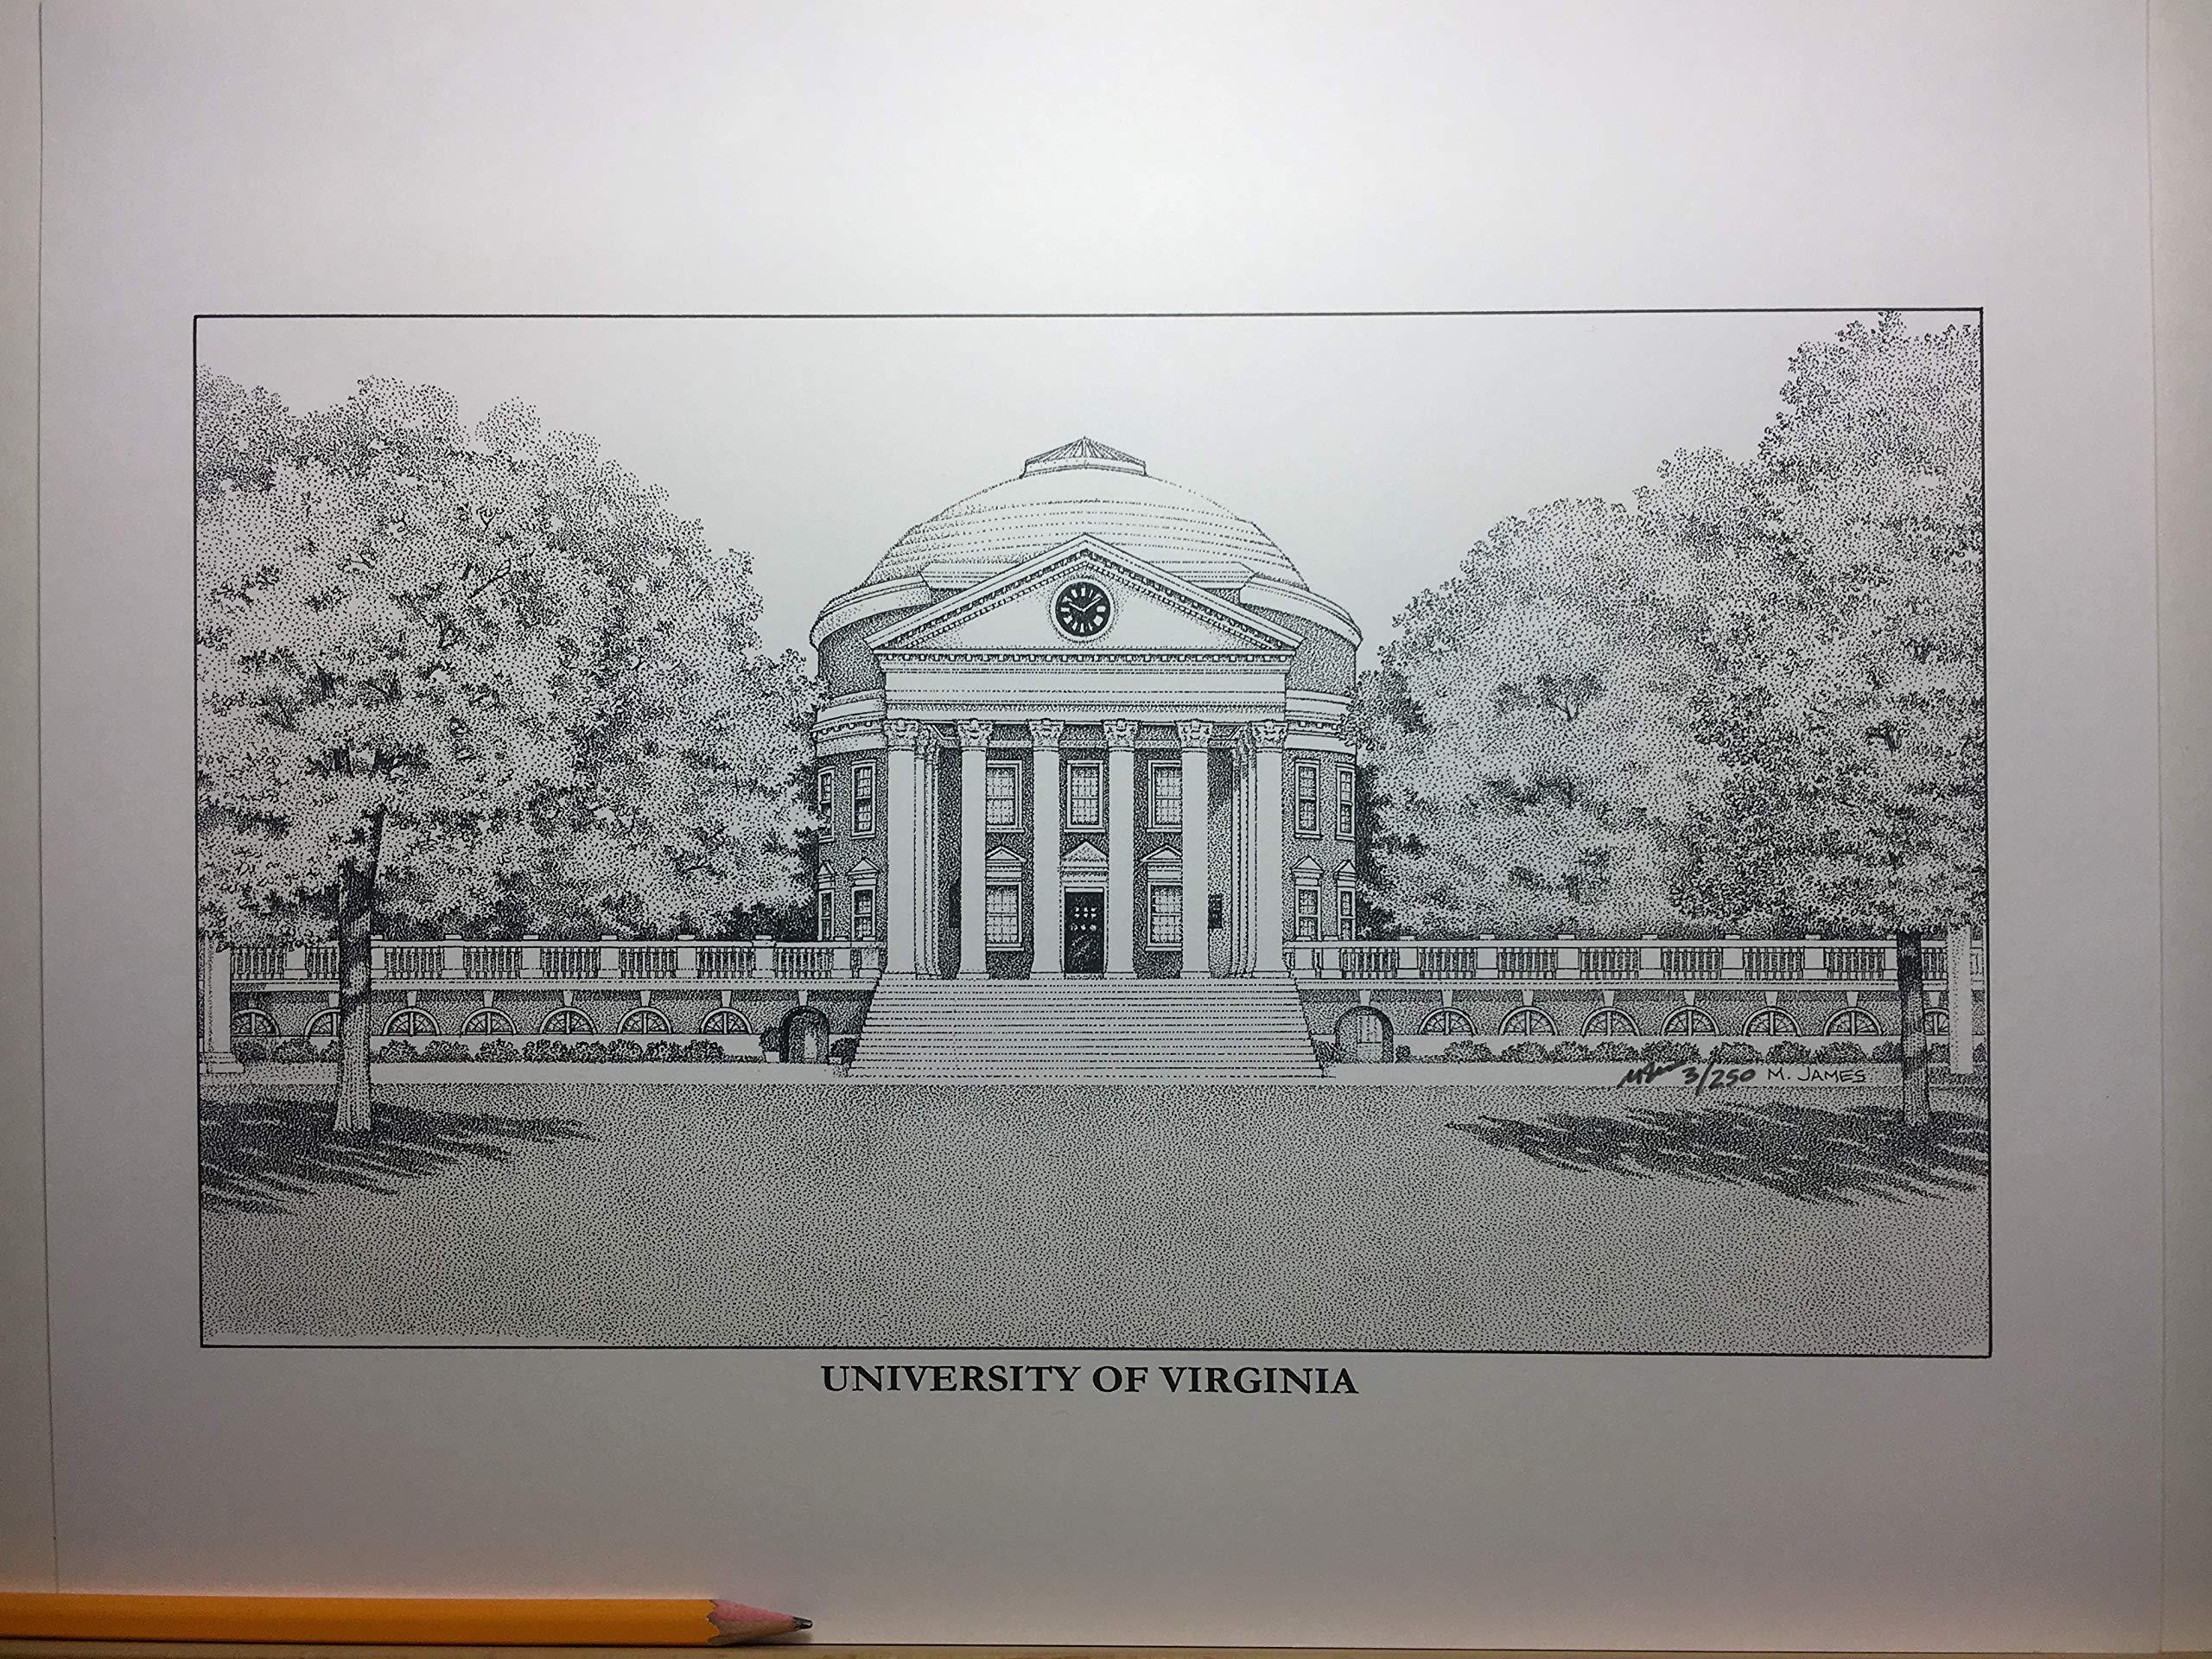 University of Virginia - The Rotunda 11''x14'' hand-drawn pen and ink print